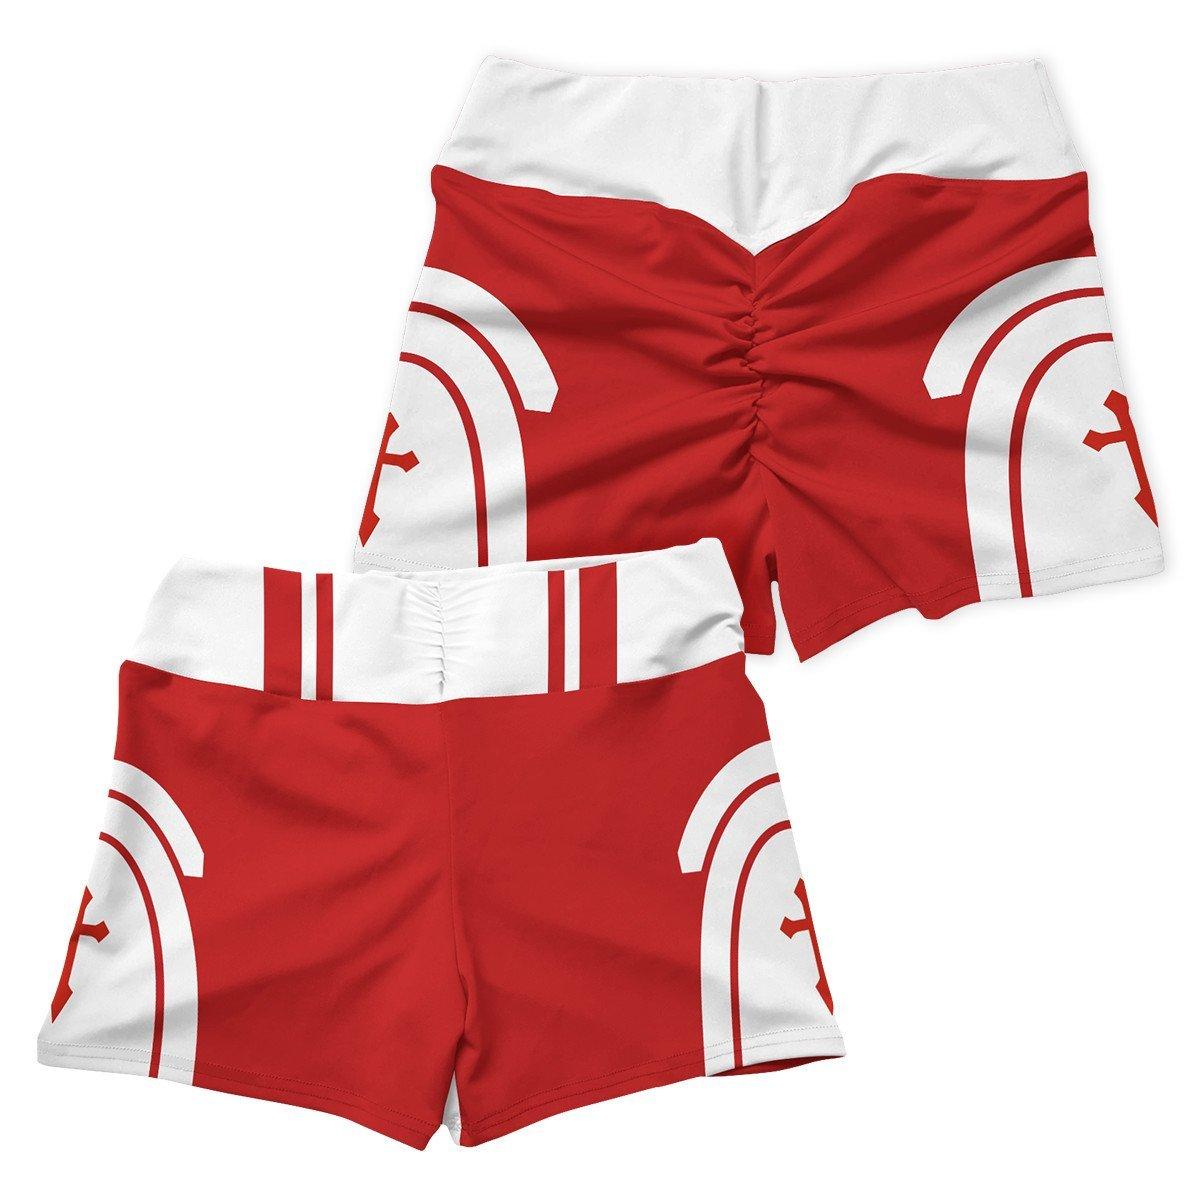 asuna summer active wear set 273487 - Anime Swimsuits